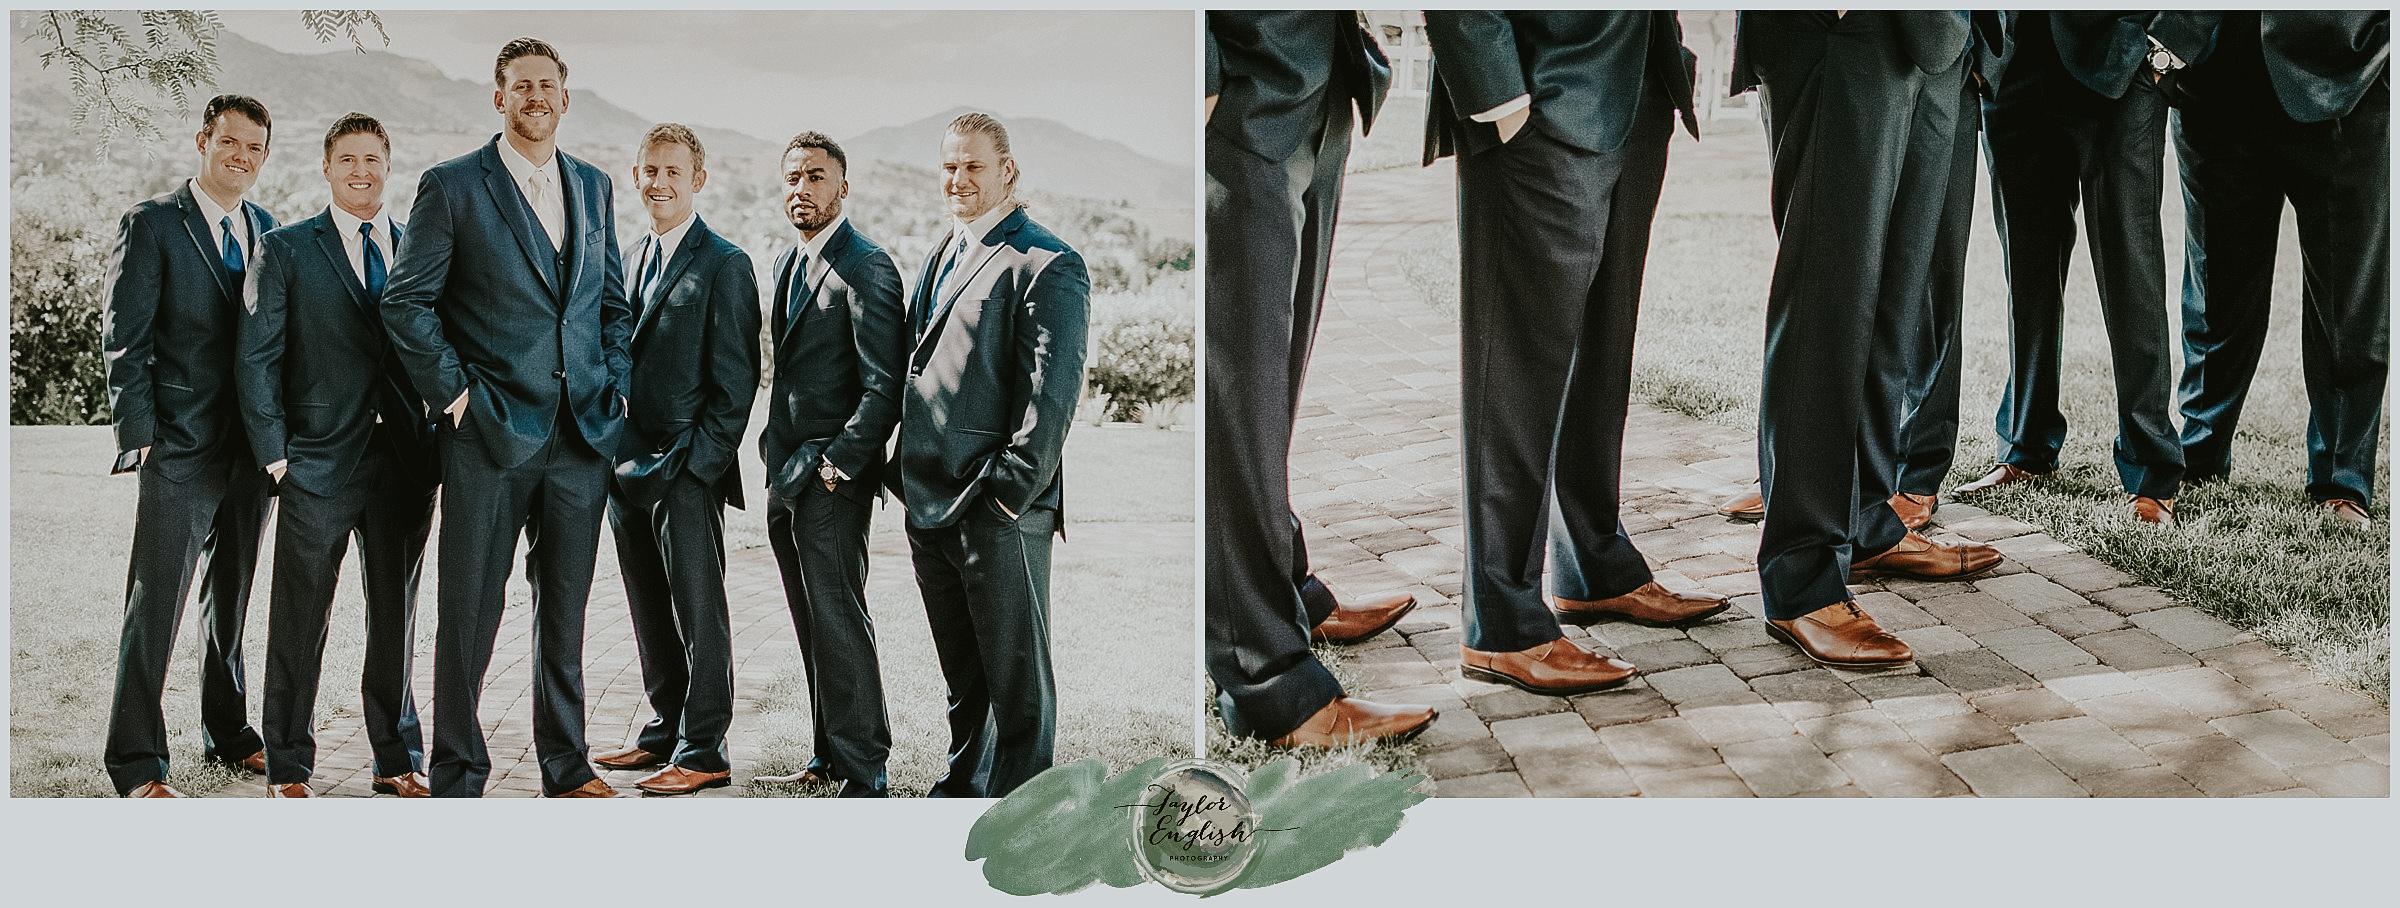 Chattanooga_Wedding_Photographer_Littleton_Colorado4